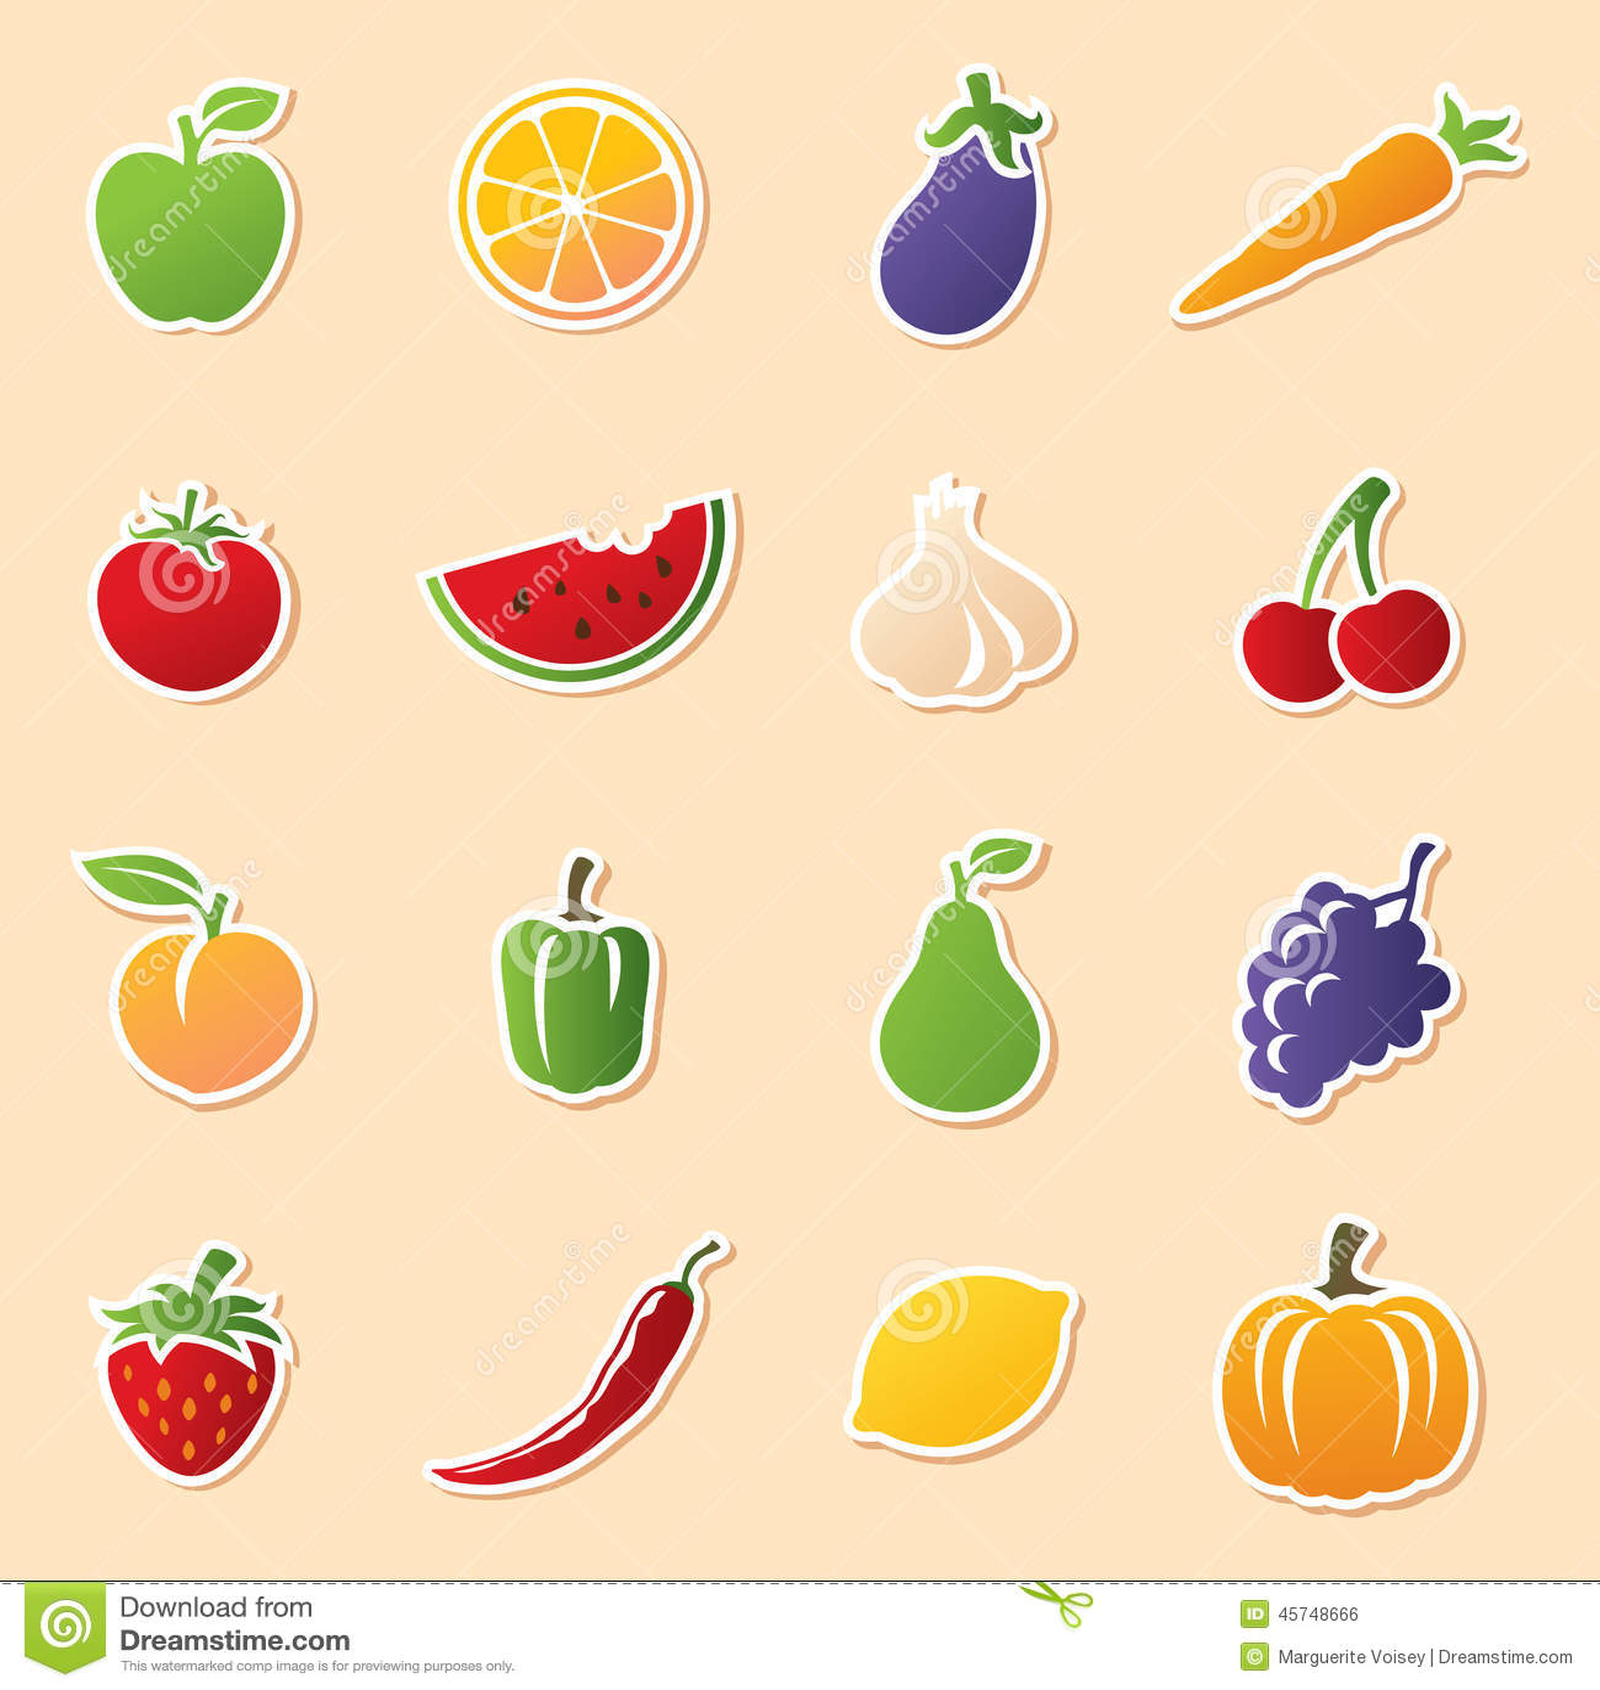 Fruit Amp Veg Cutouts Stock Vector Illustration Of Peach